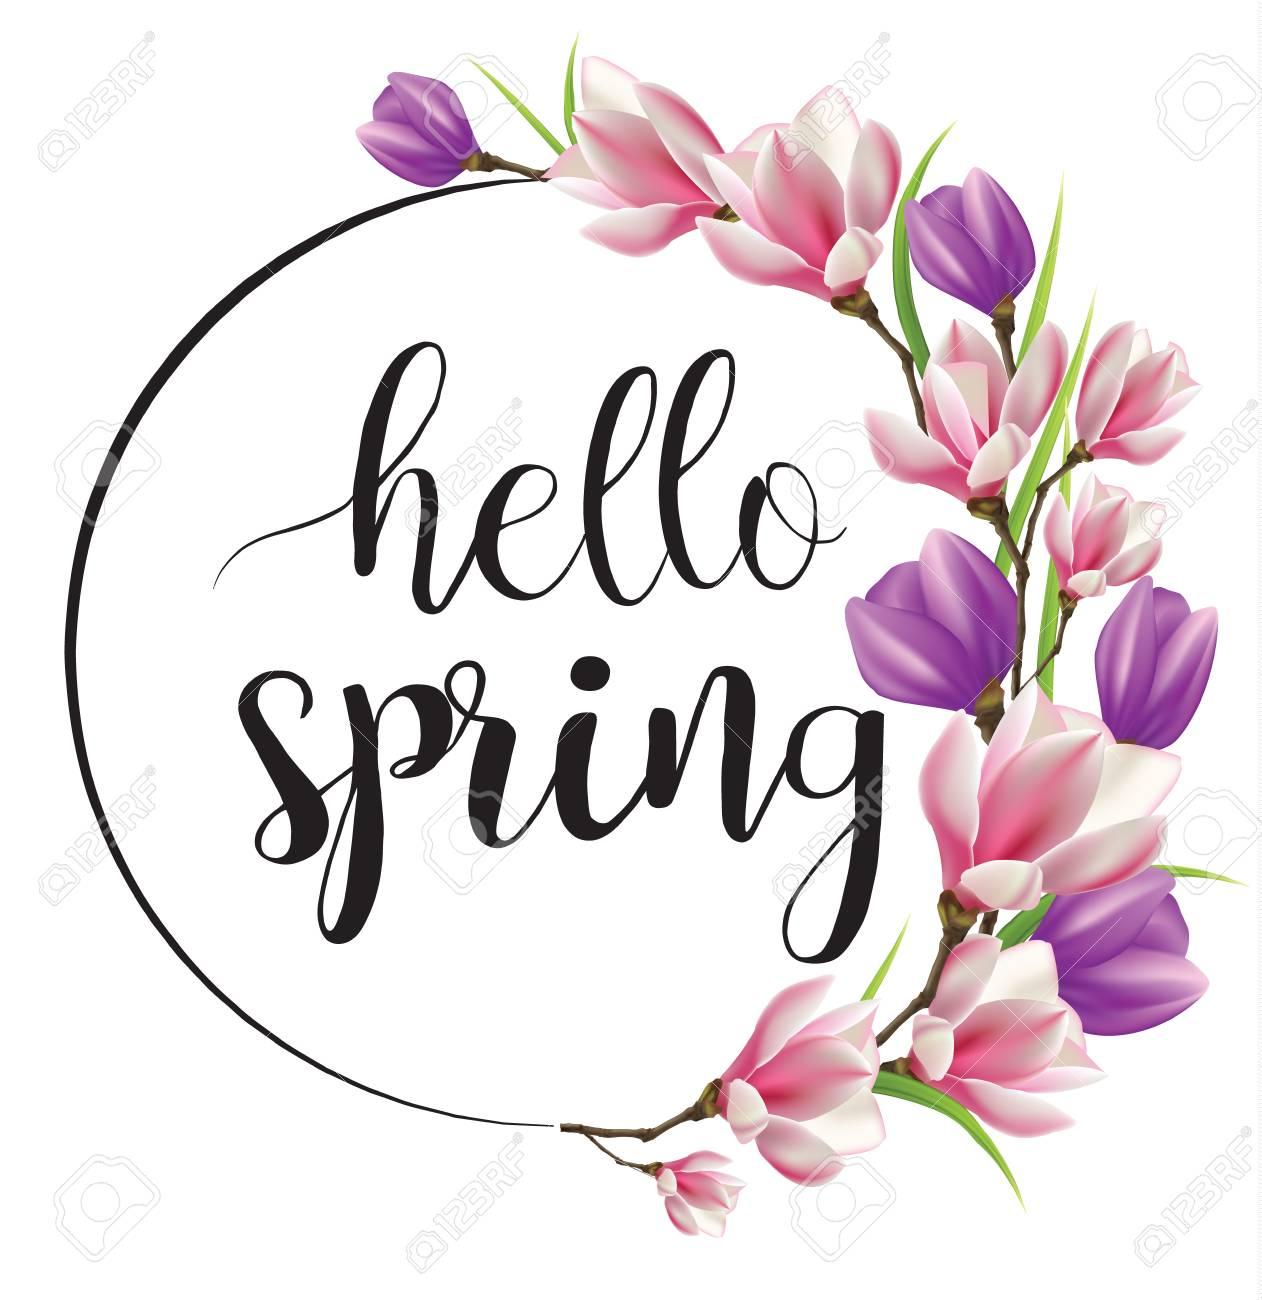 Hello spring, wreath of flowers.